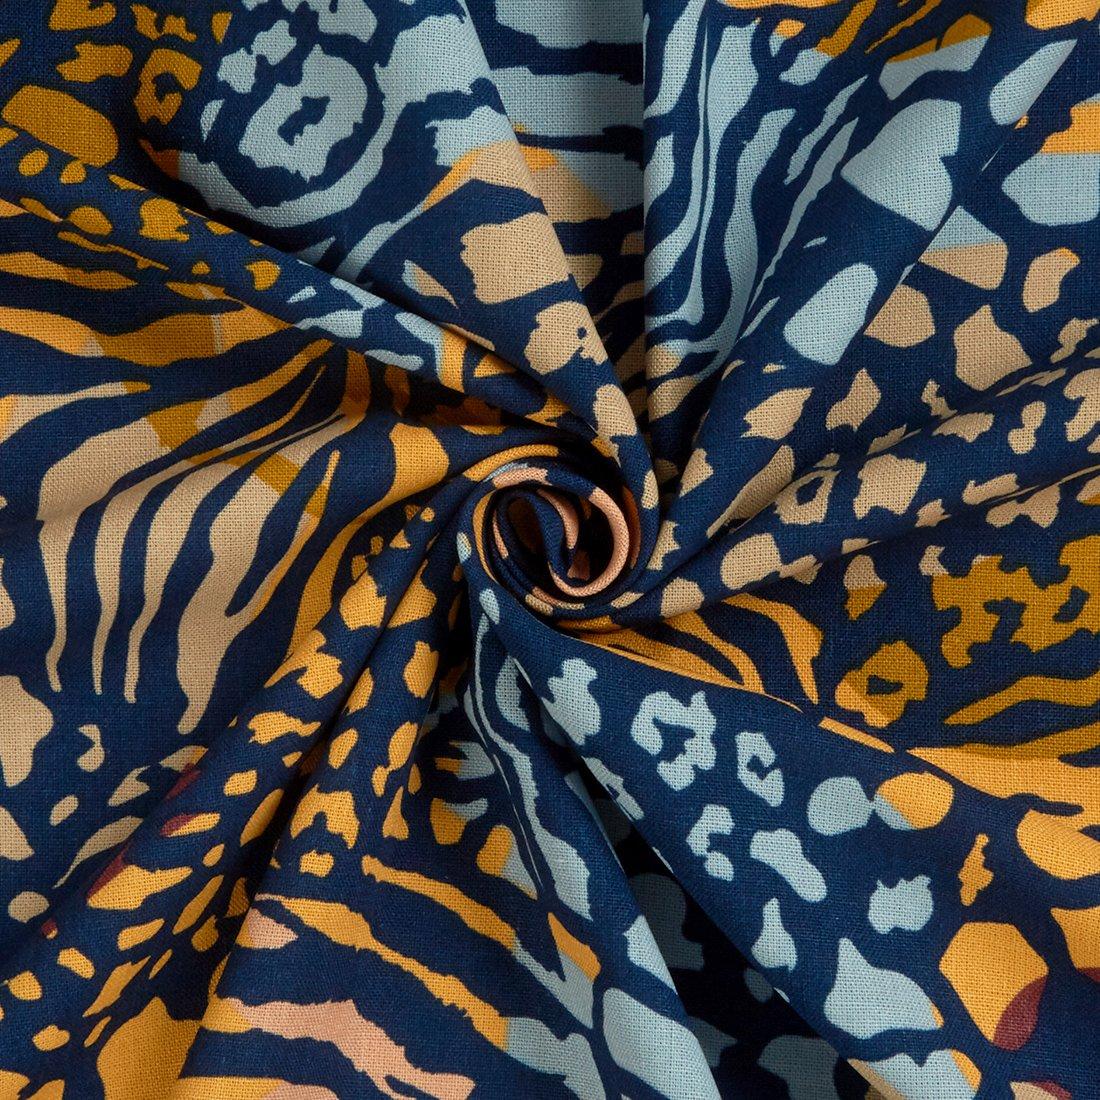 Abstract Animal Blue Dress Fabric